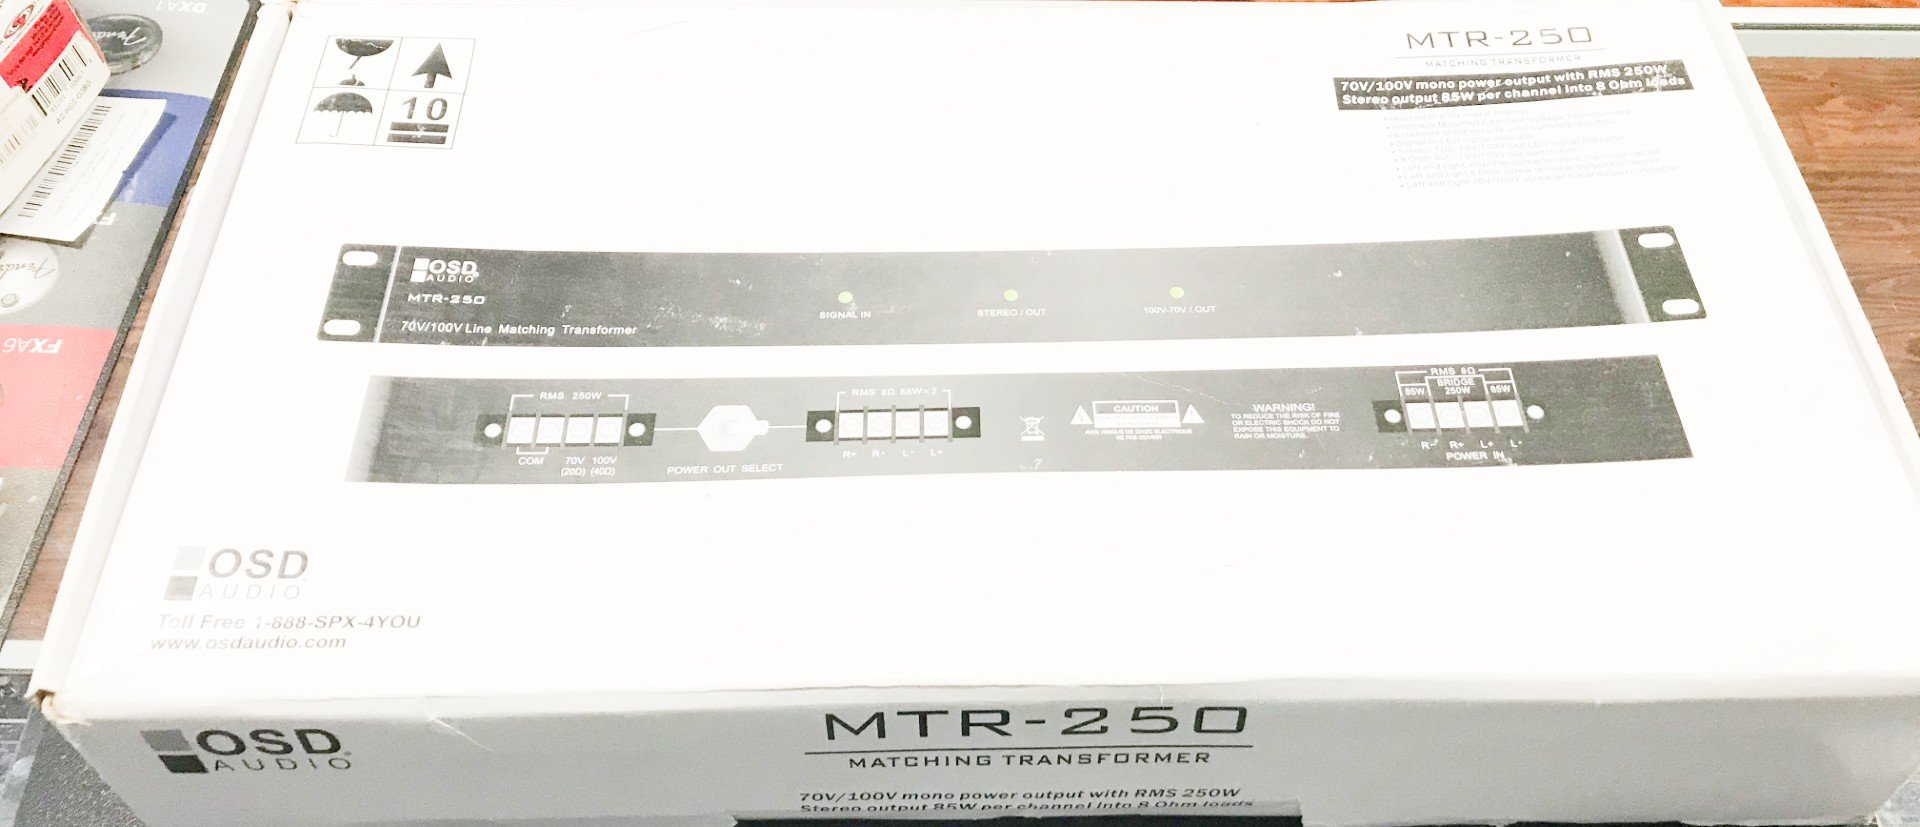 OSD Audio MTR250 power matching transformer